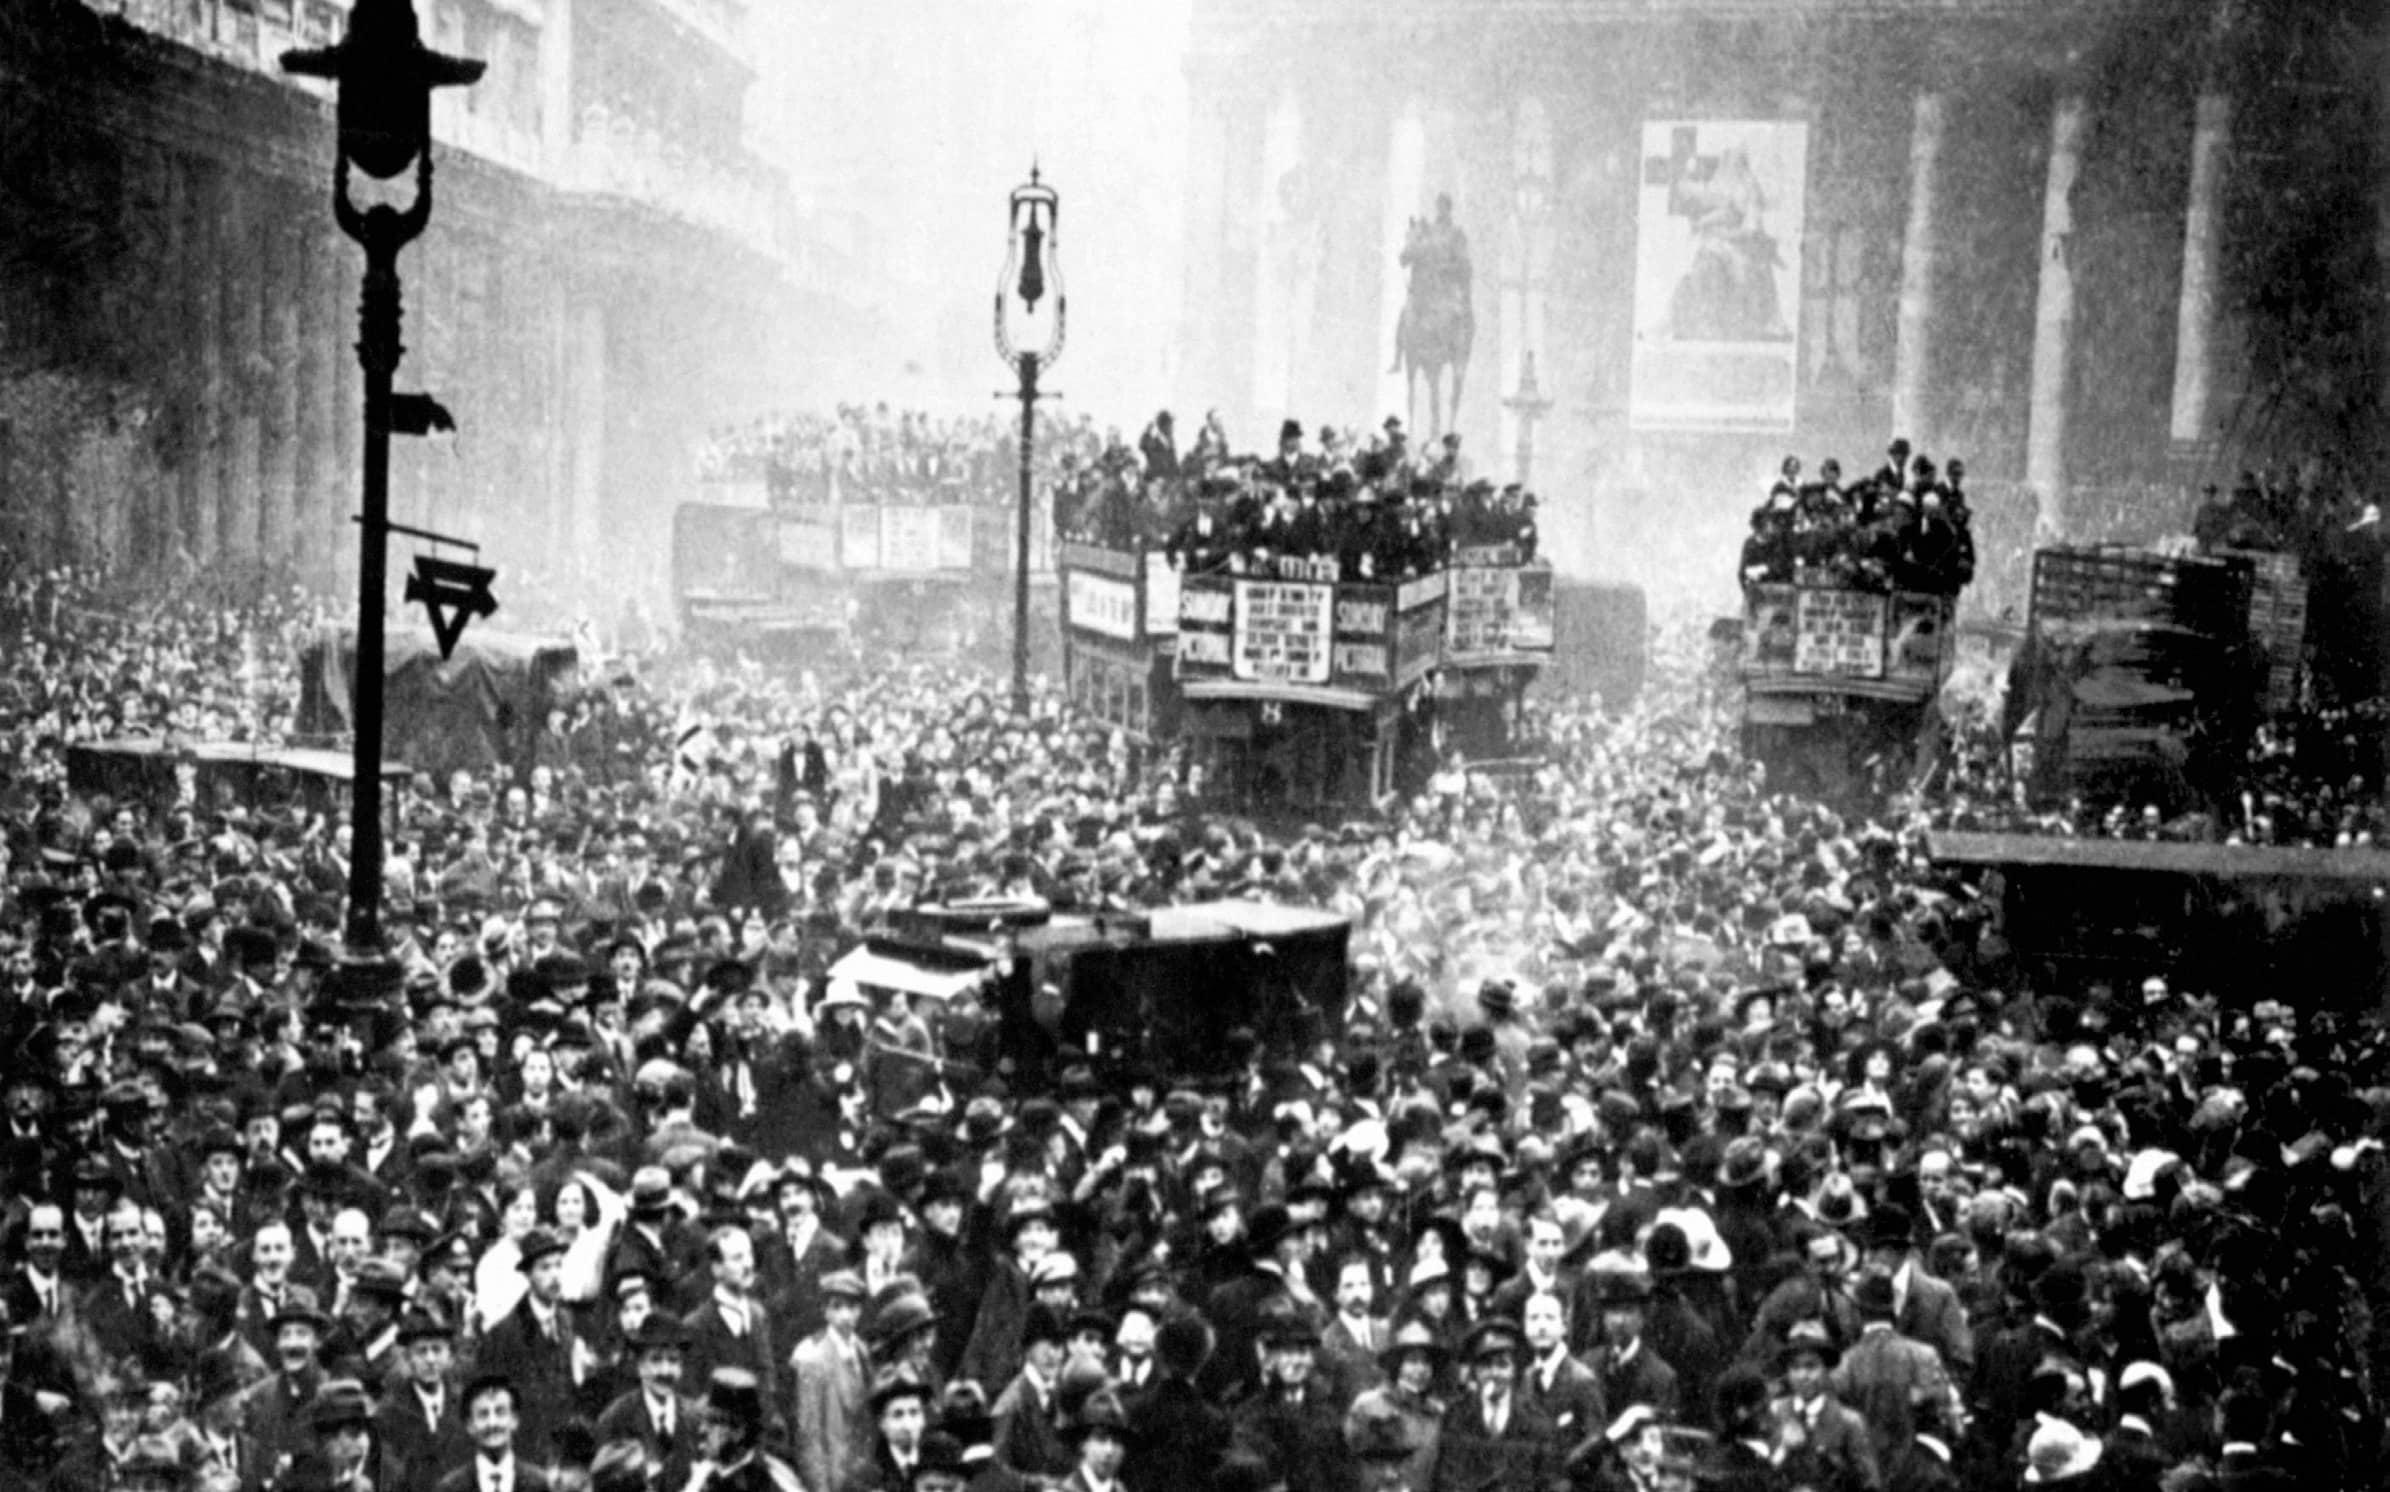 November 11, 1918: The Hour of Deliverance